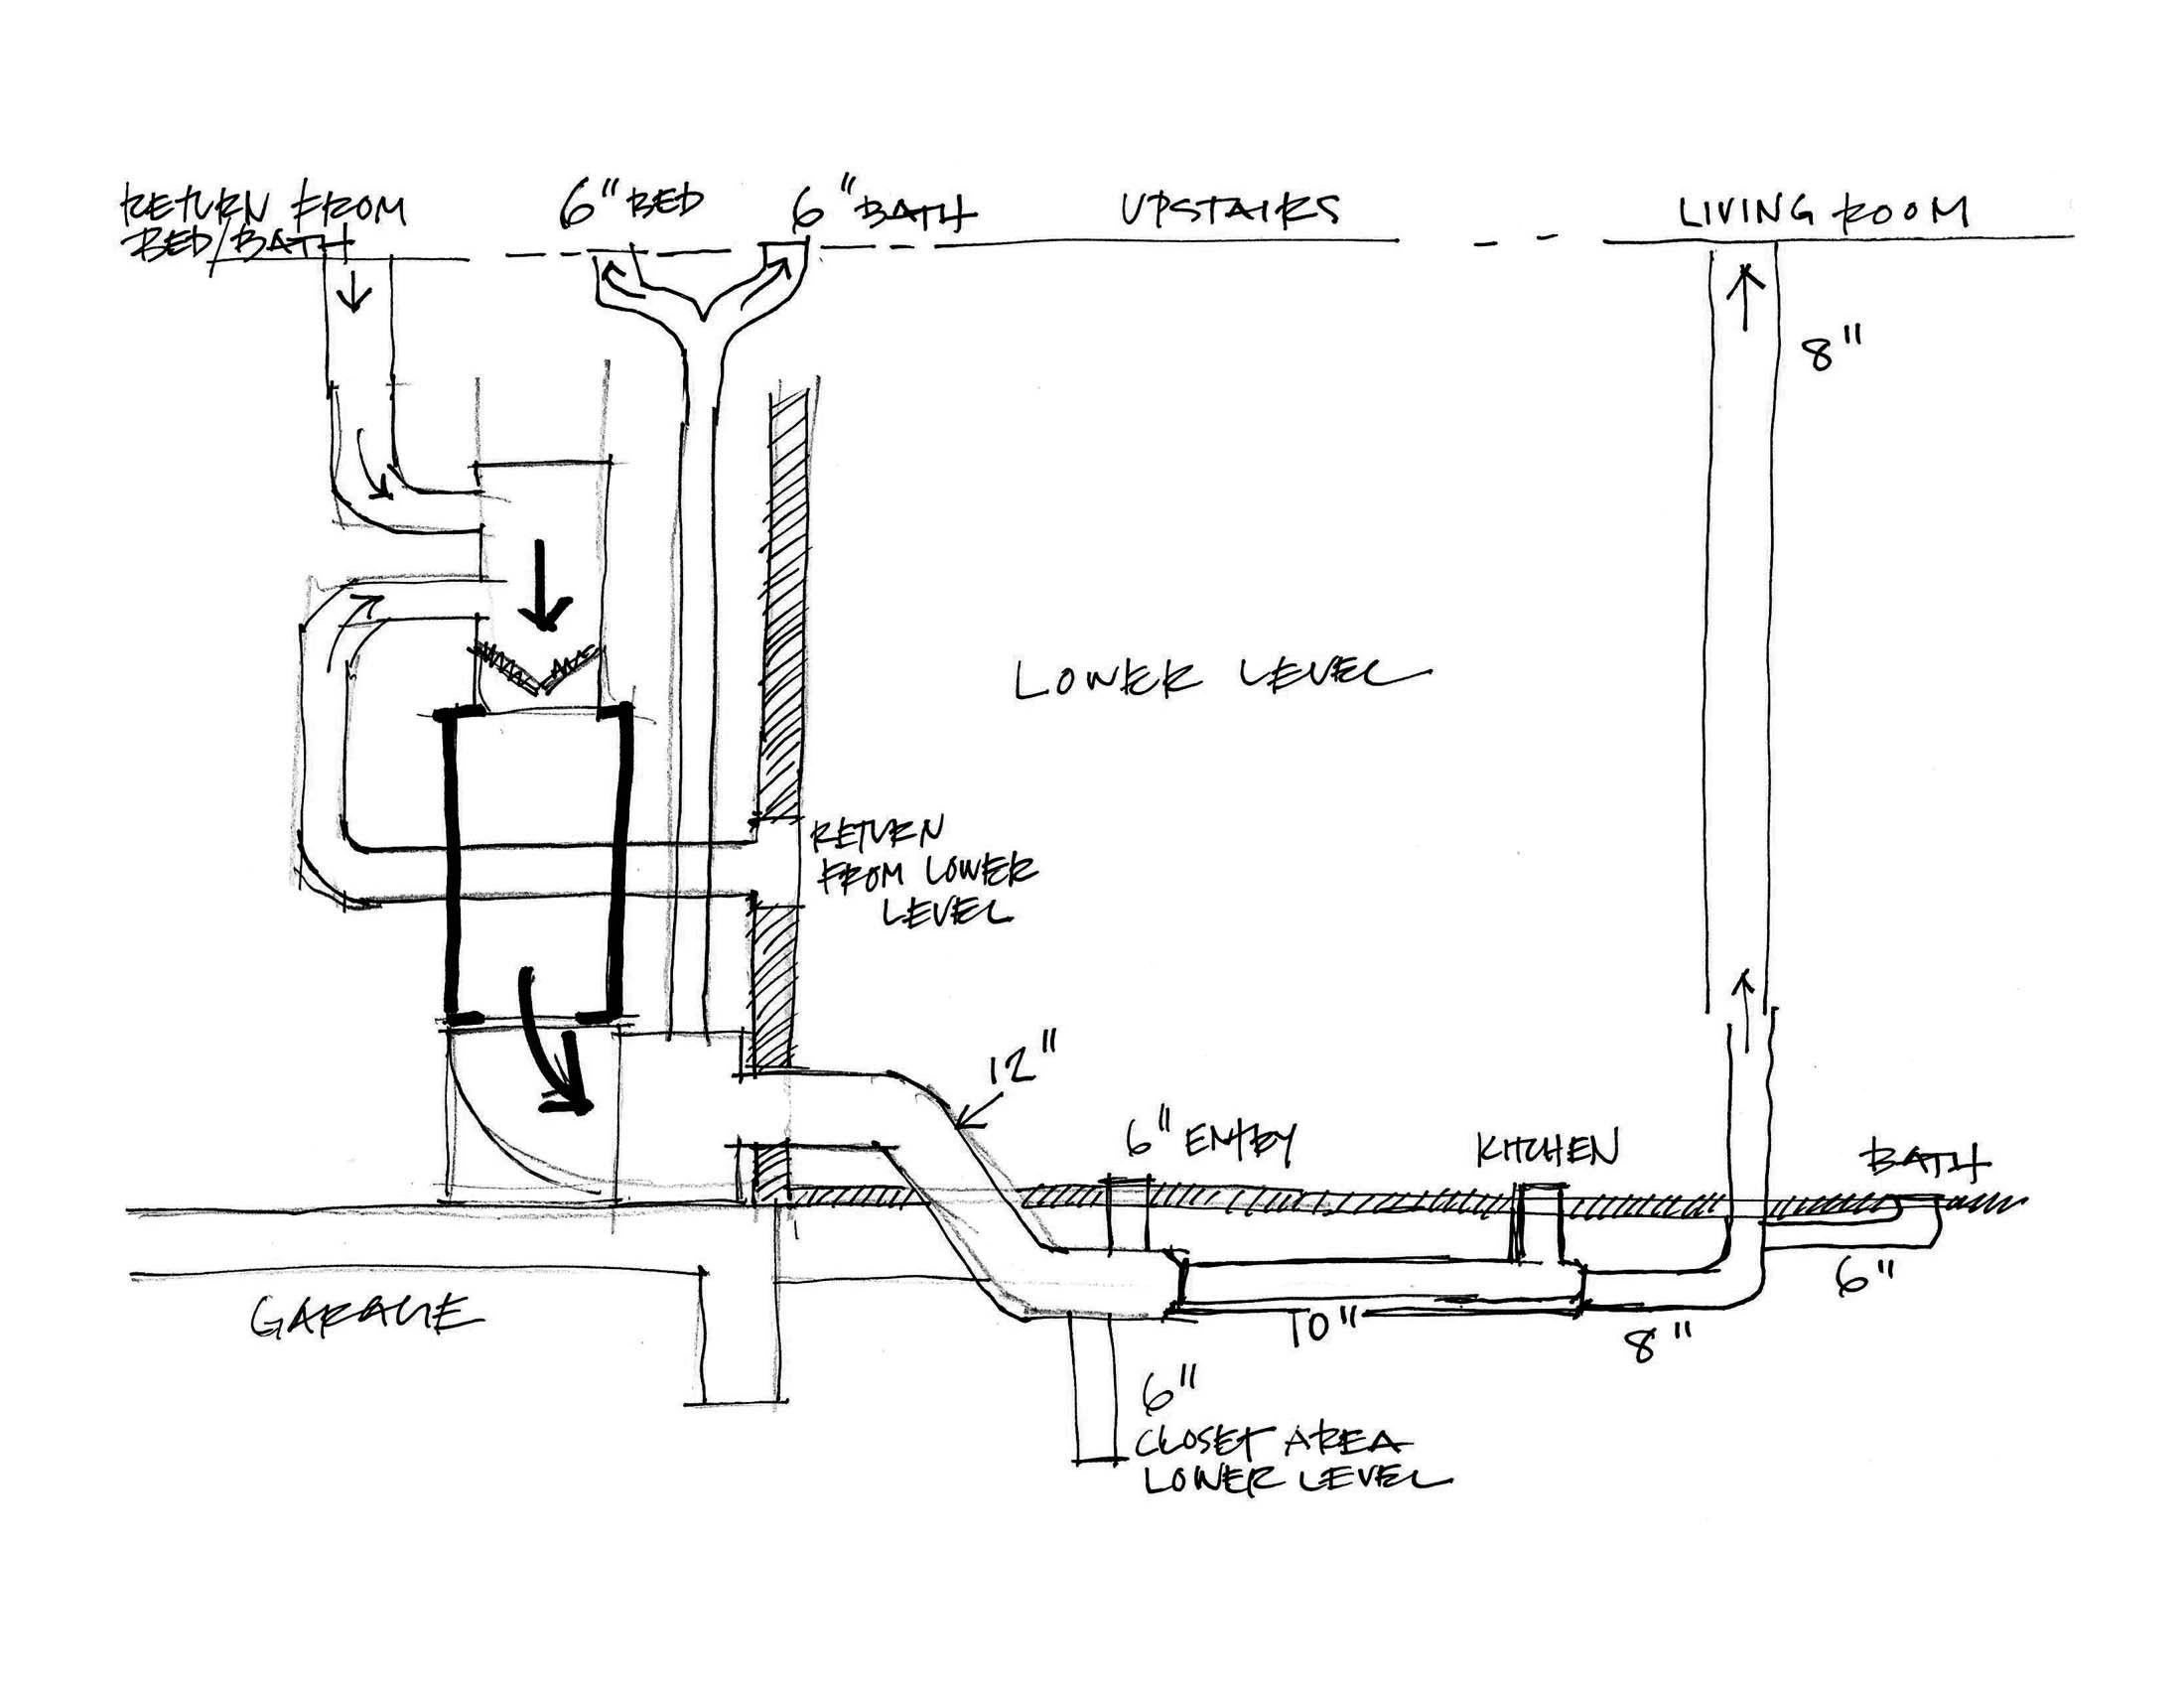 50 Bathroom Plumbing Layout Drawing Wn1p Plumbing Layout Bathroom Plumbing Layout Kitchen Plumbing Diagram [ jpg ]